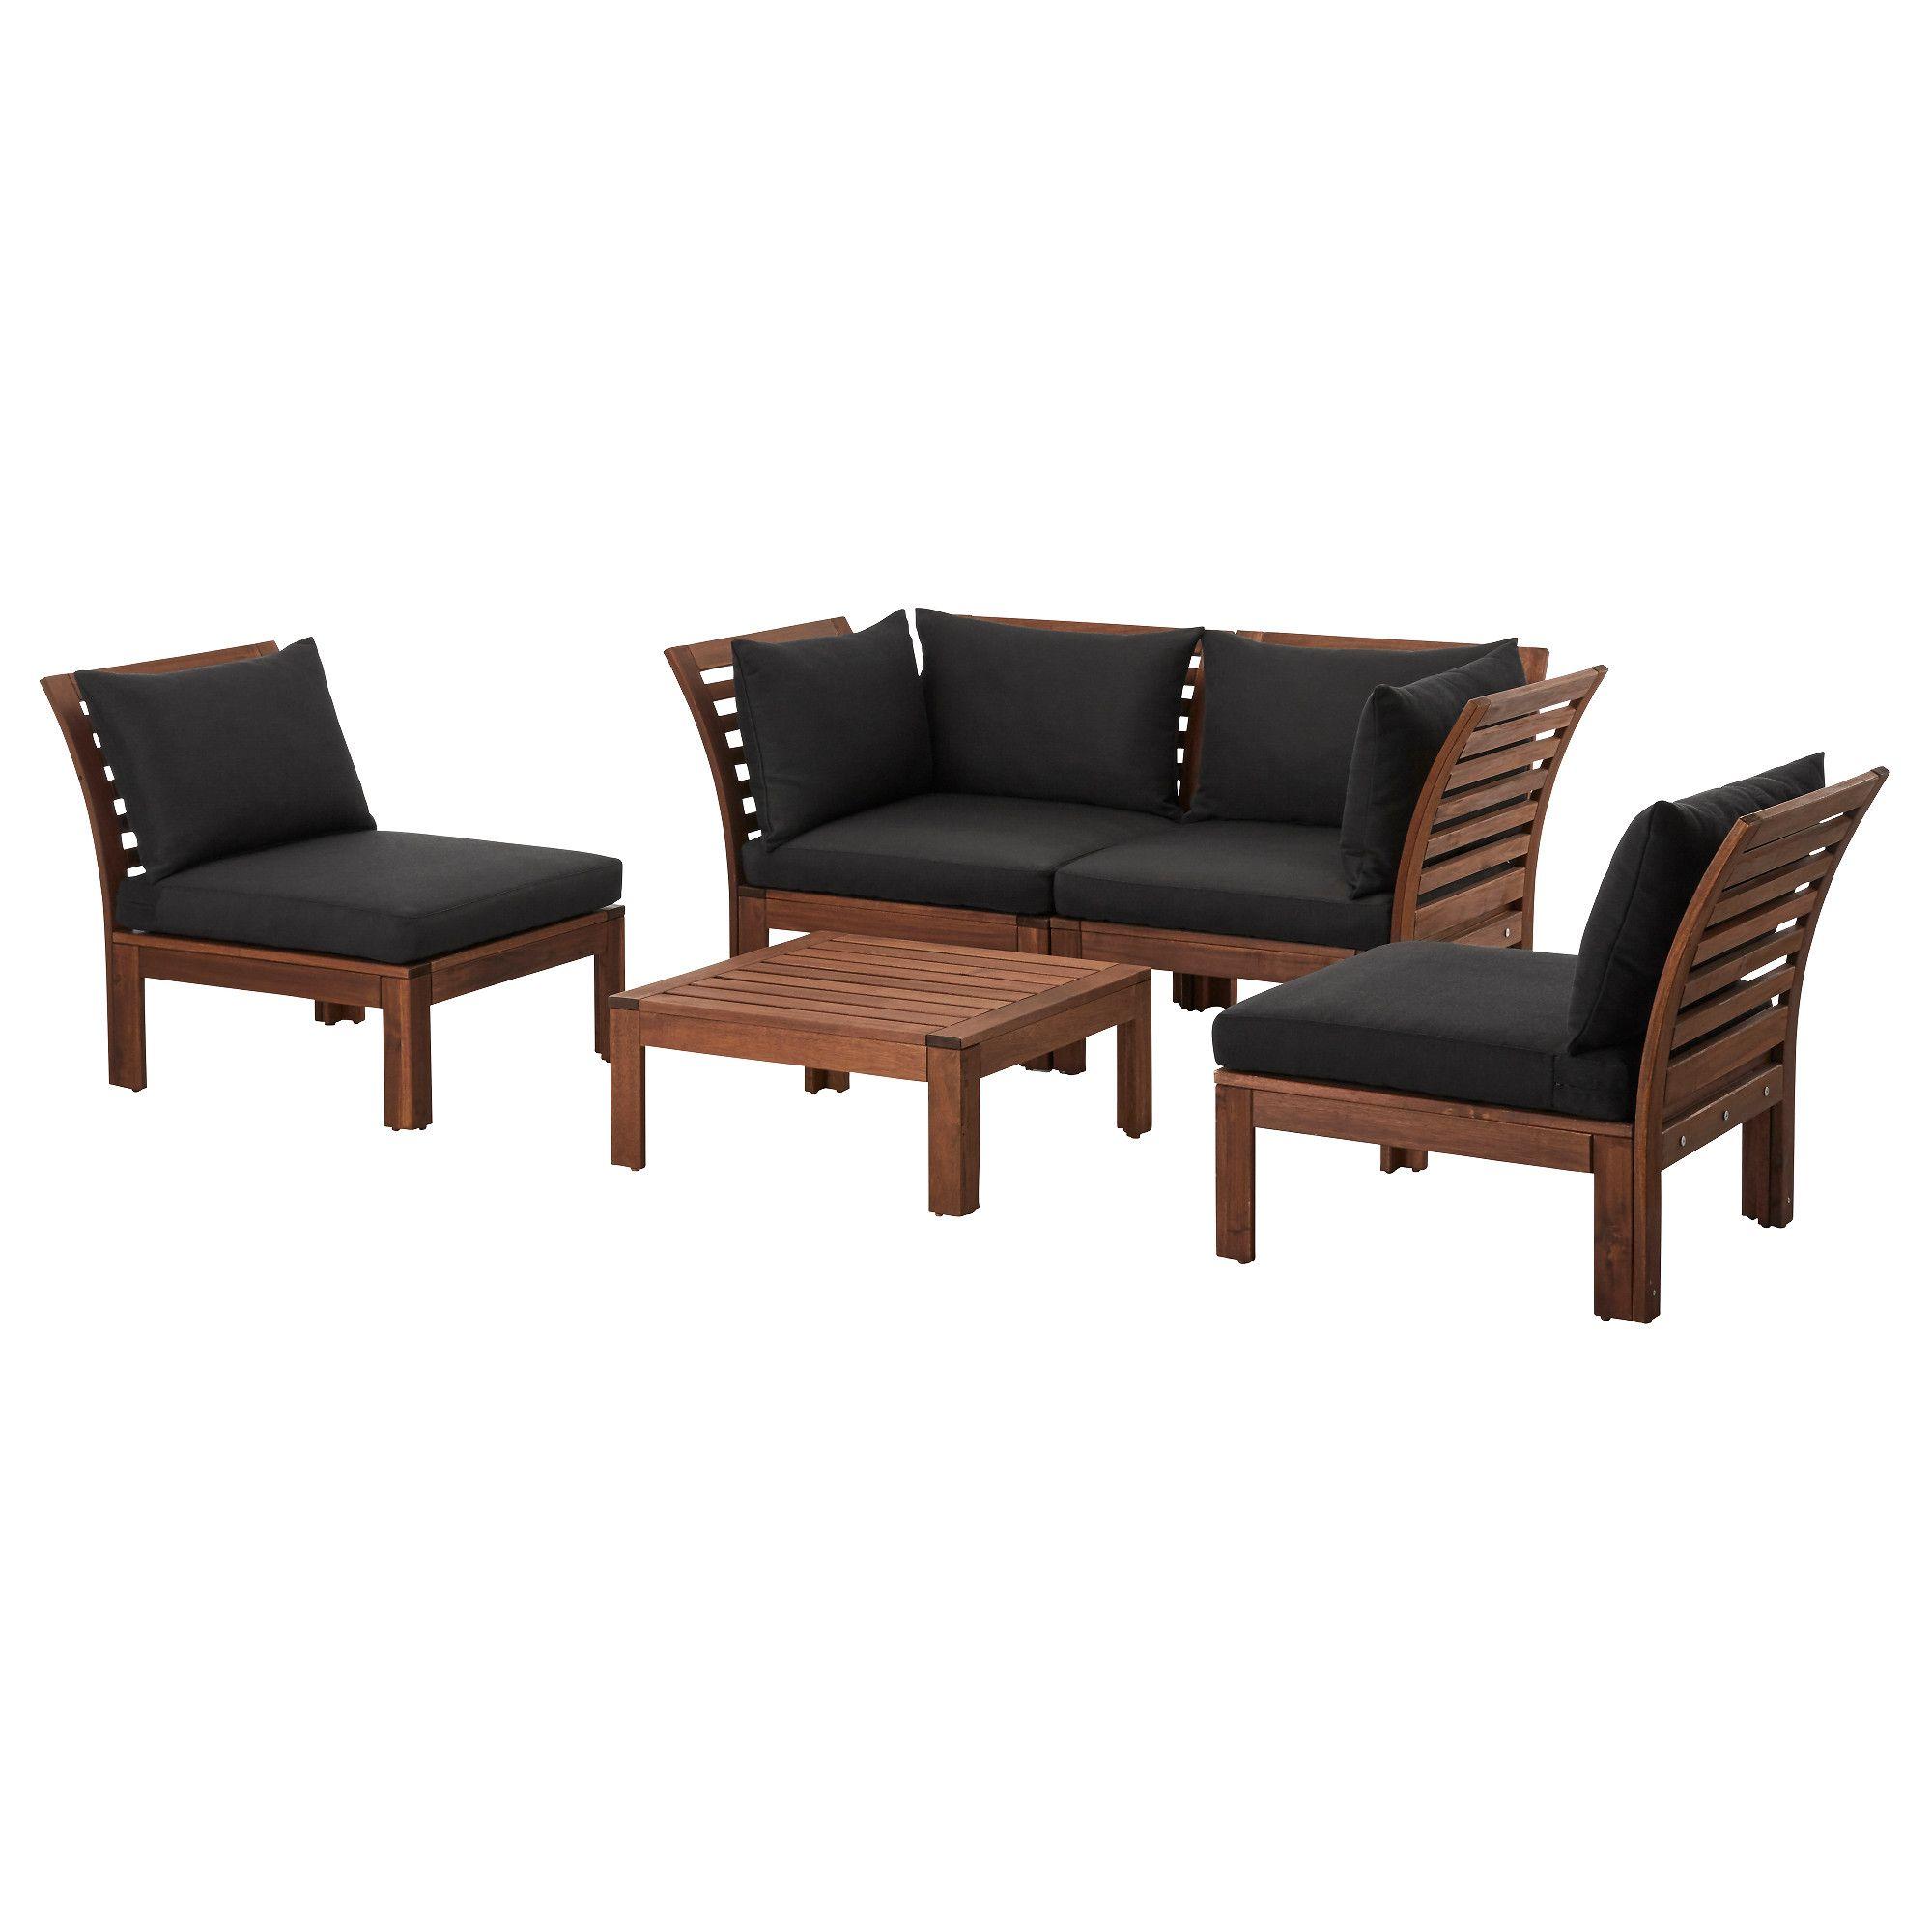 ÄPPLARÖ 4seat conversation set, outdoor brown stained